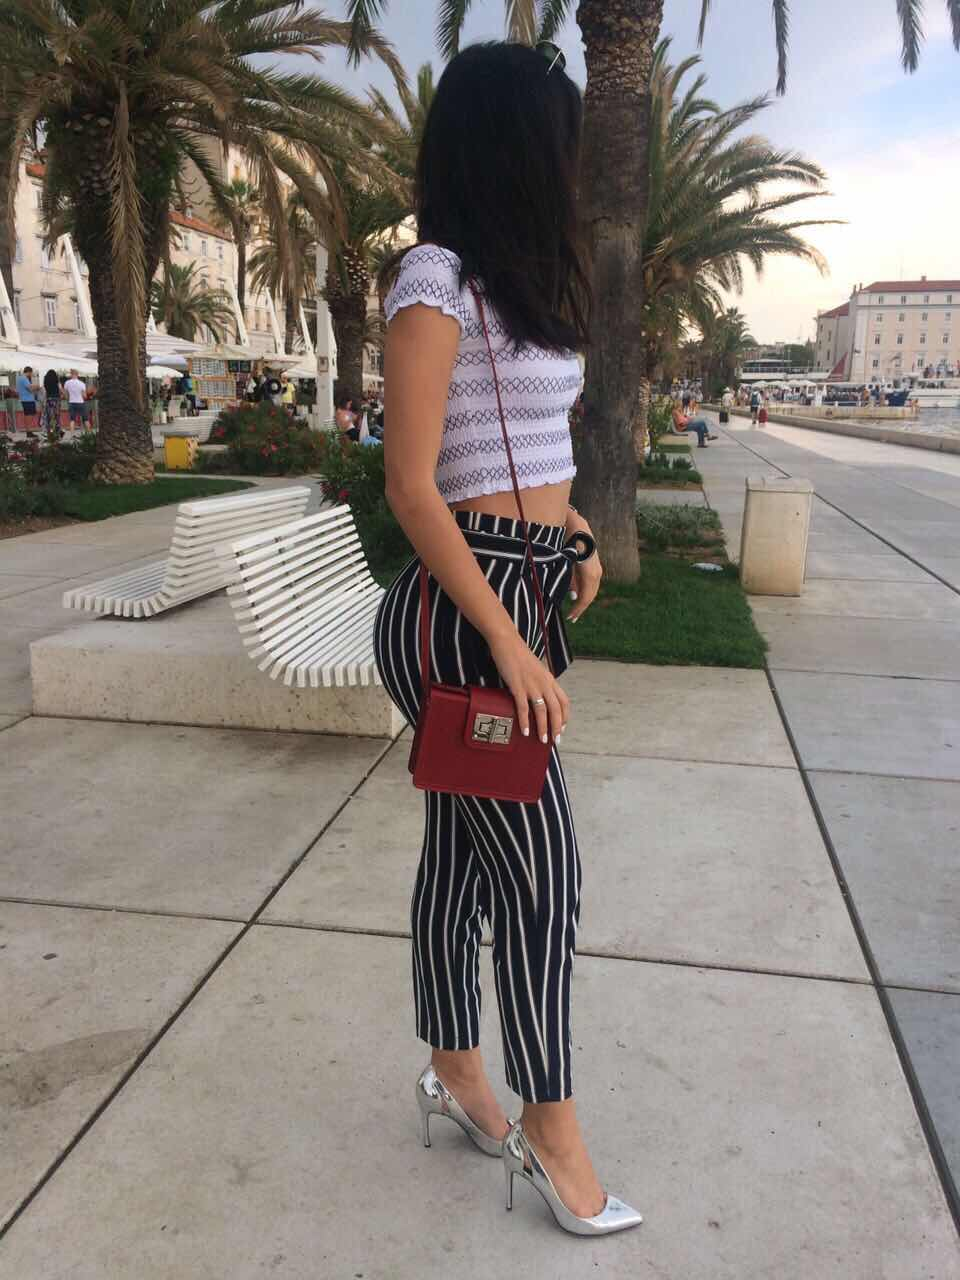 Emily_handbag_4